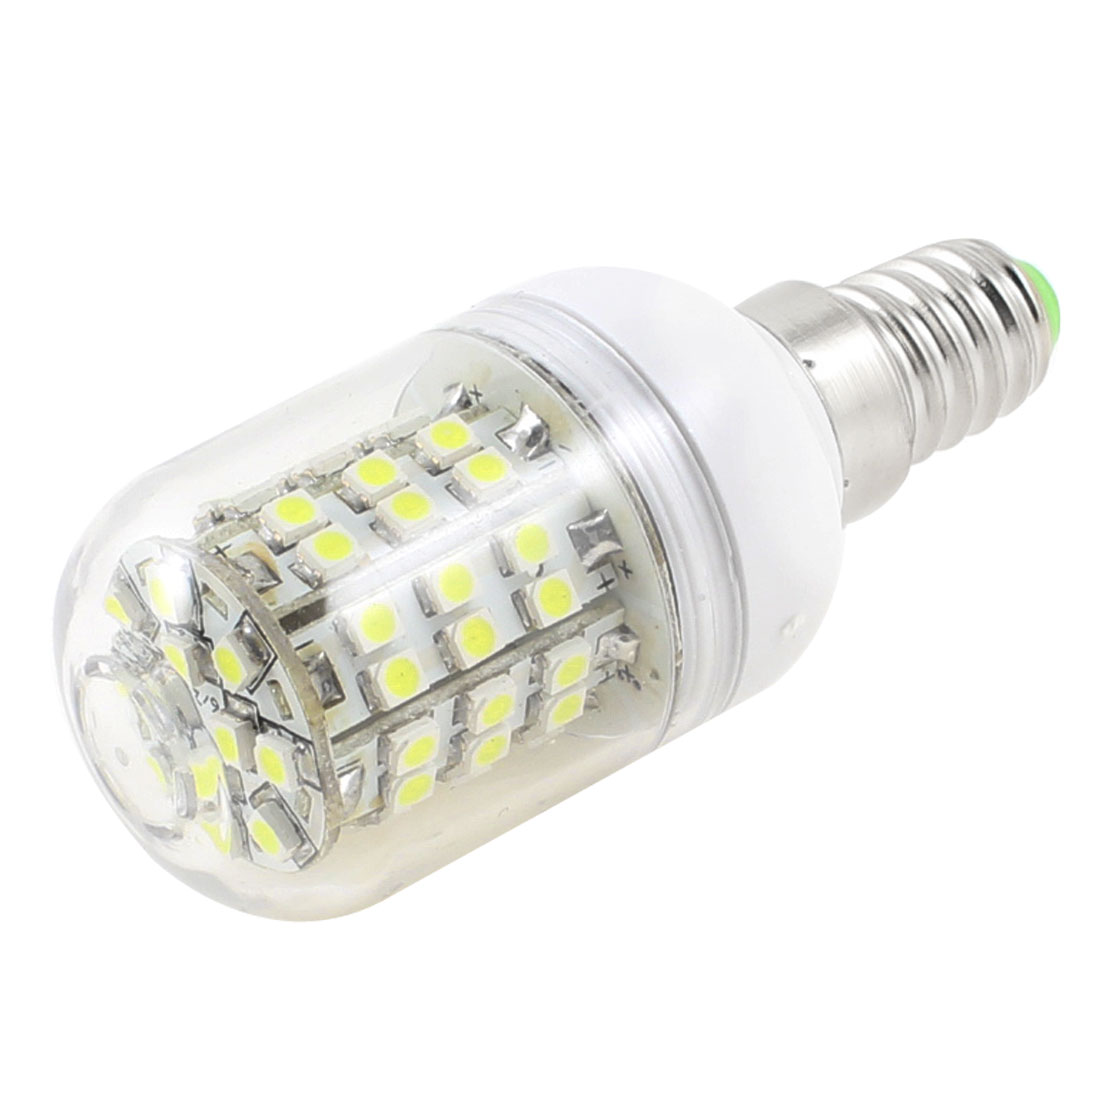 5W White Light Energy Saving LED Corn Bulb E14 3528 60SMD Lamp AC 200-240V